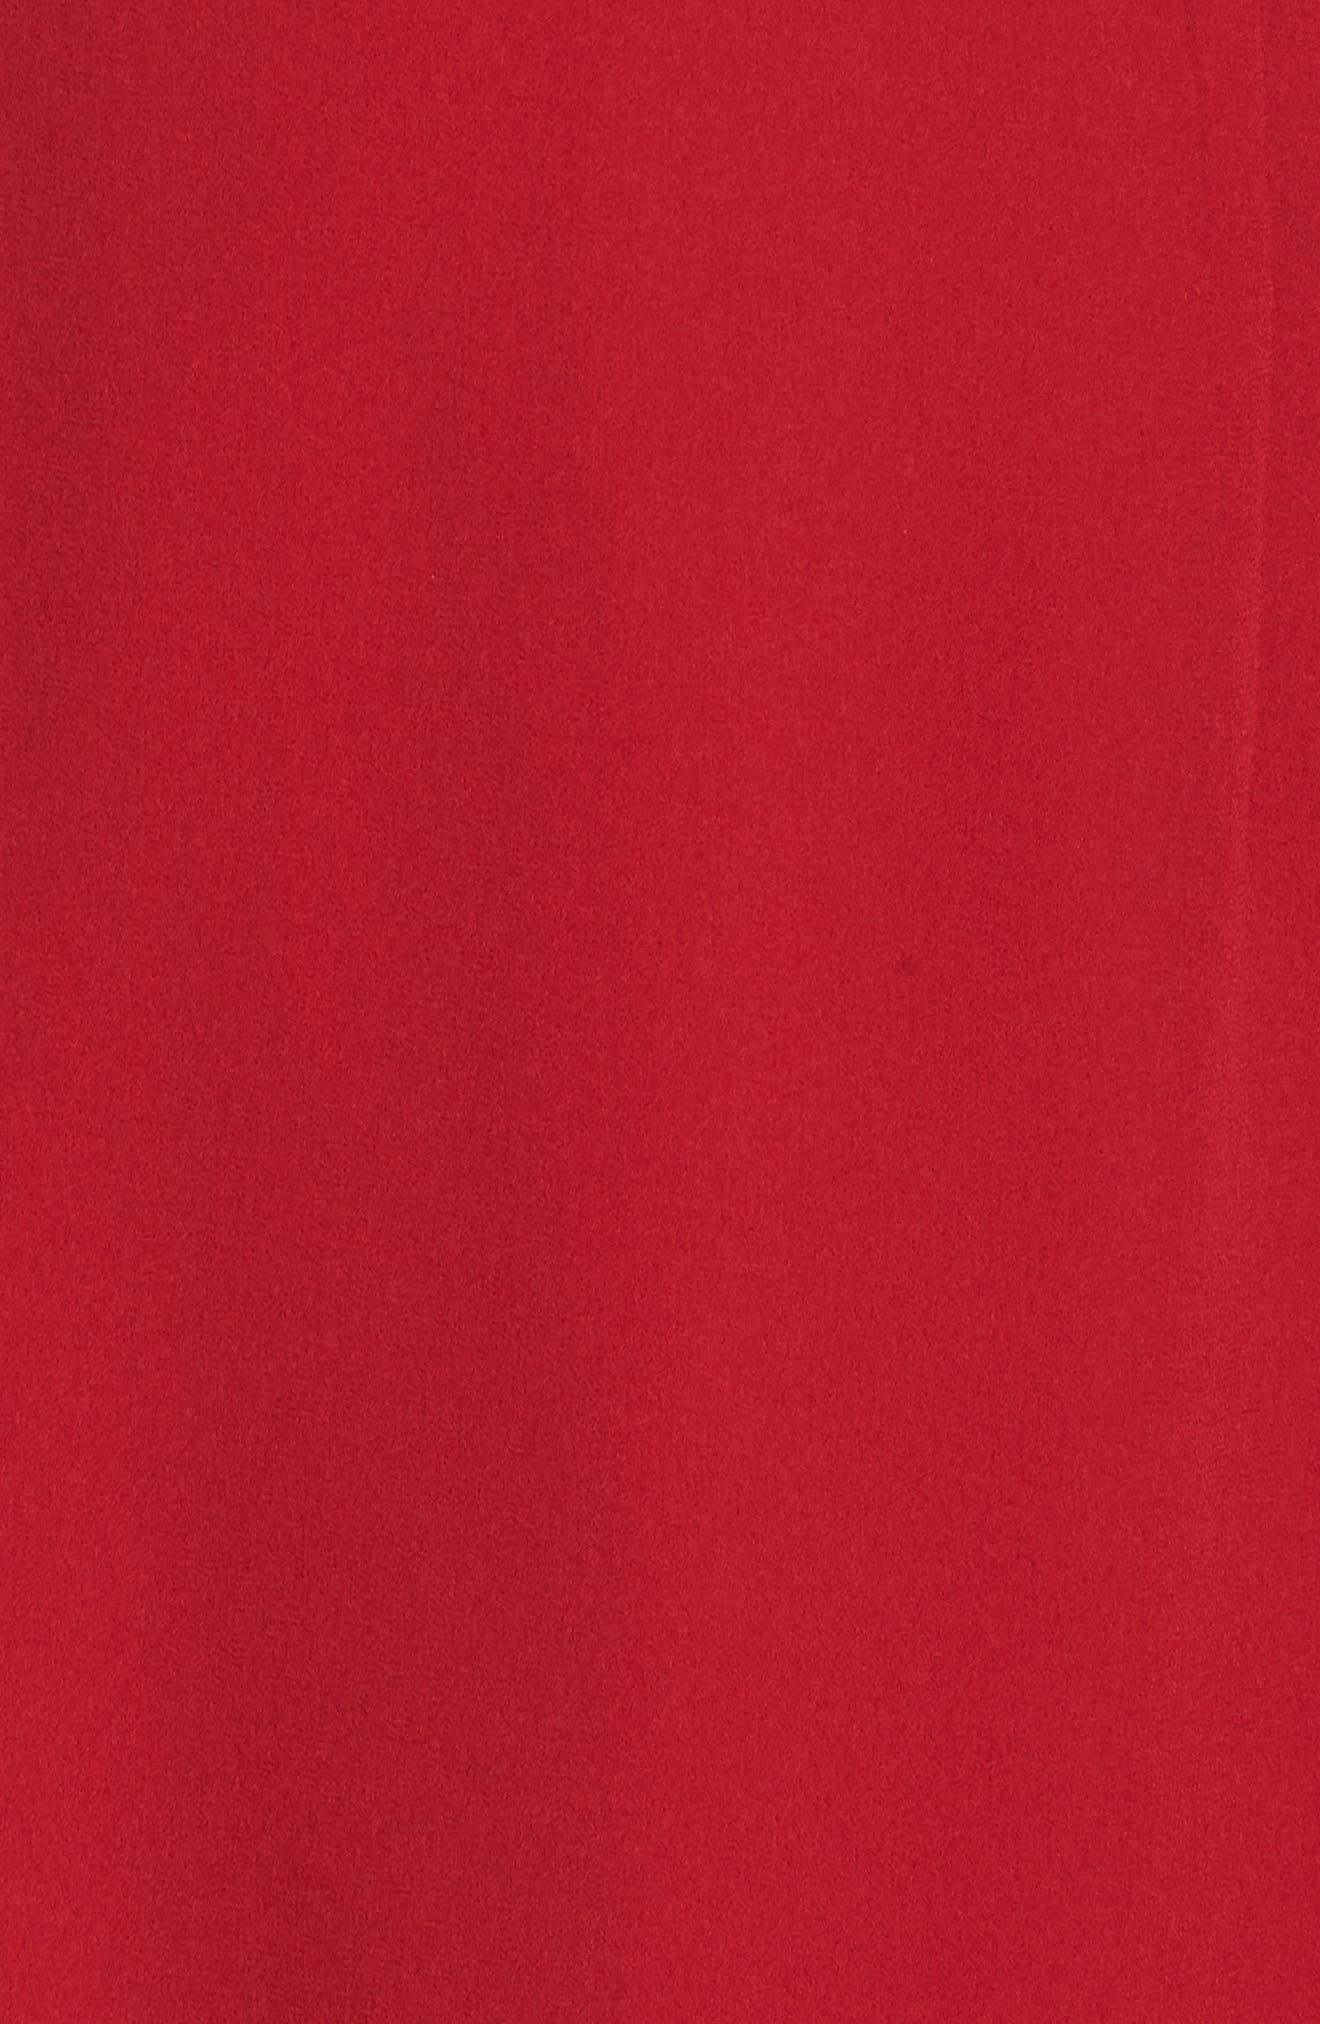 Pleat Sleeve & Ruffle Hem Dress,                             Alternate thumbnail 6, color,                             RED JESTER